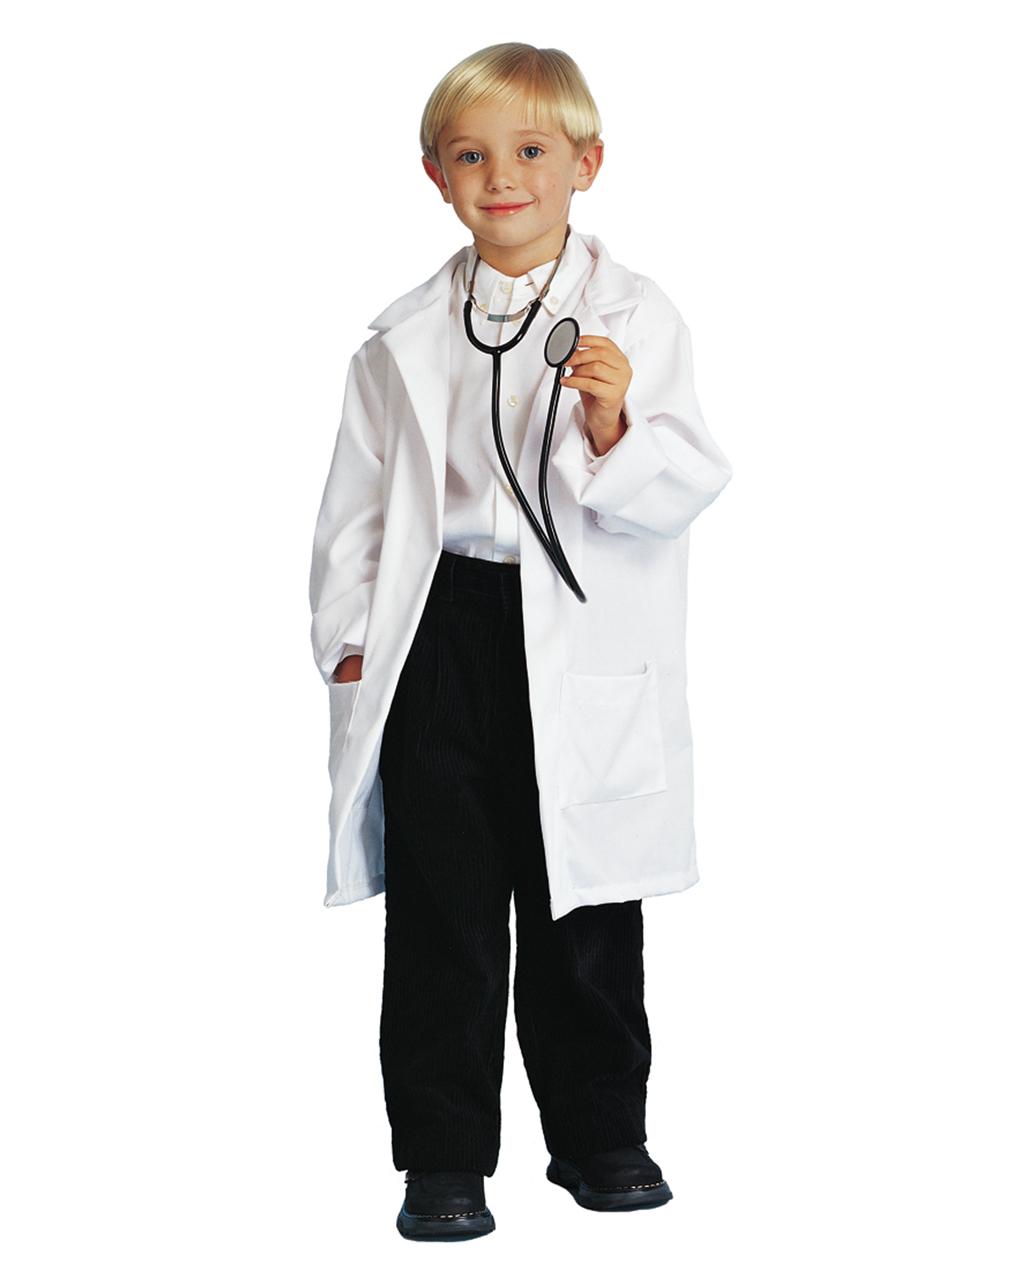 c10bae459371 Child Doctor Coat White -A White Lab Coat for Kids